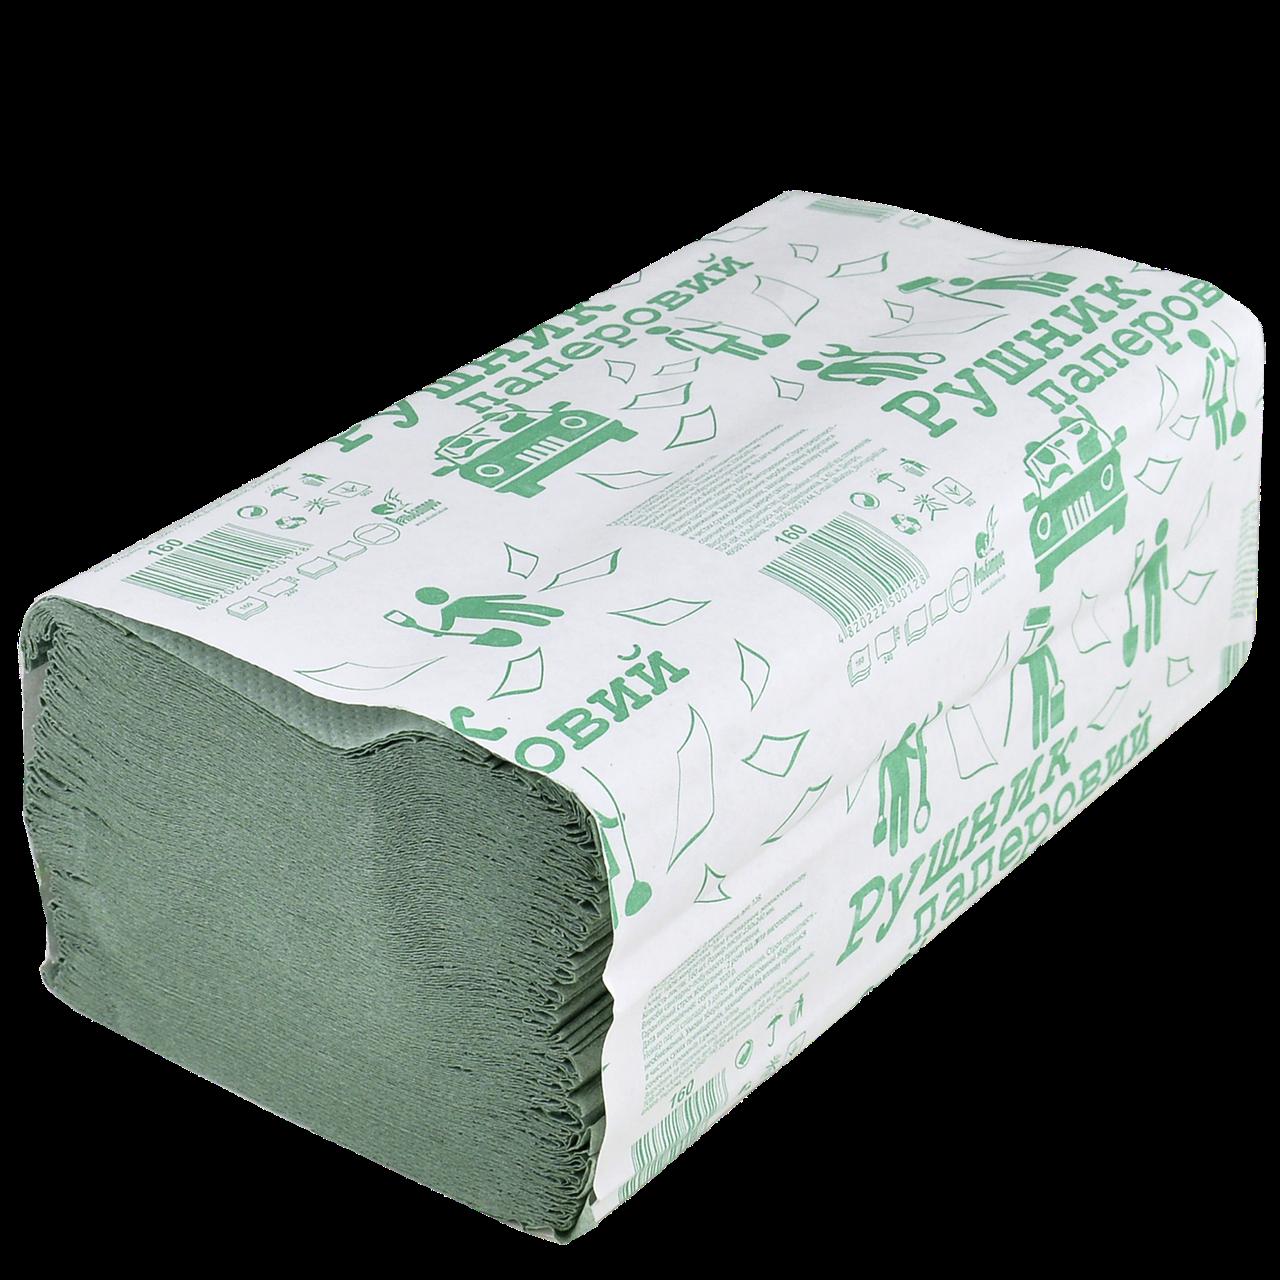 Бумажное полотенце Зеленое 24*23см 160шт 25шт/ящ